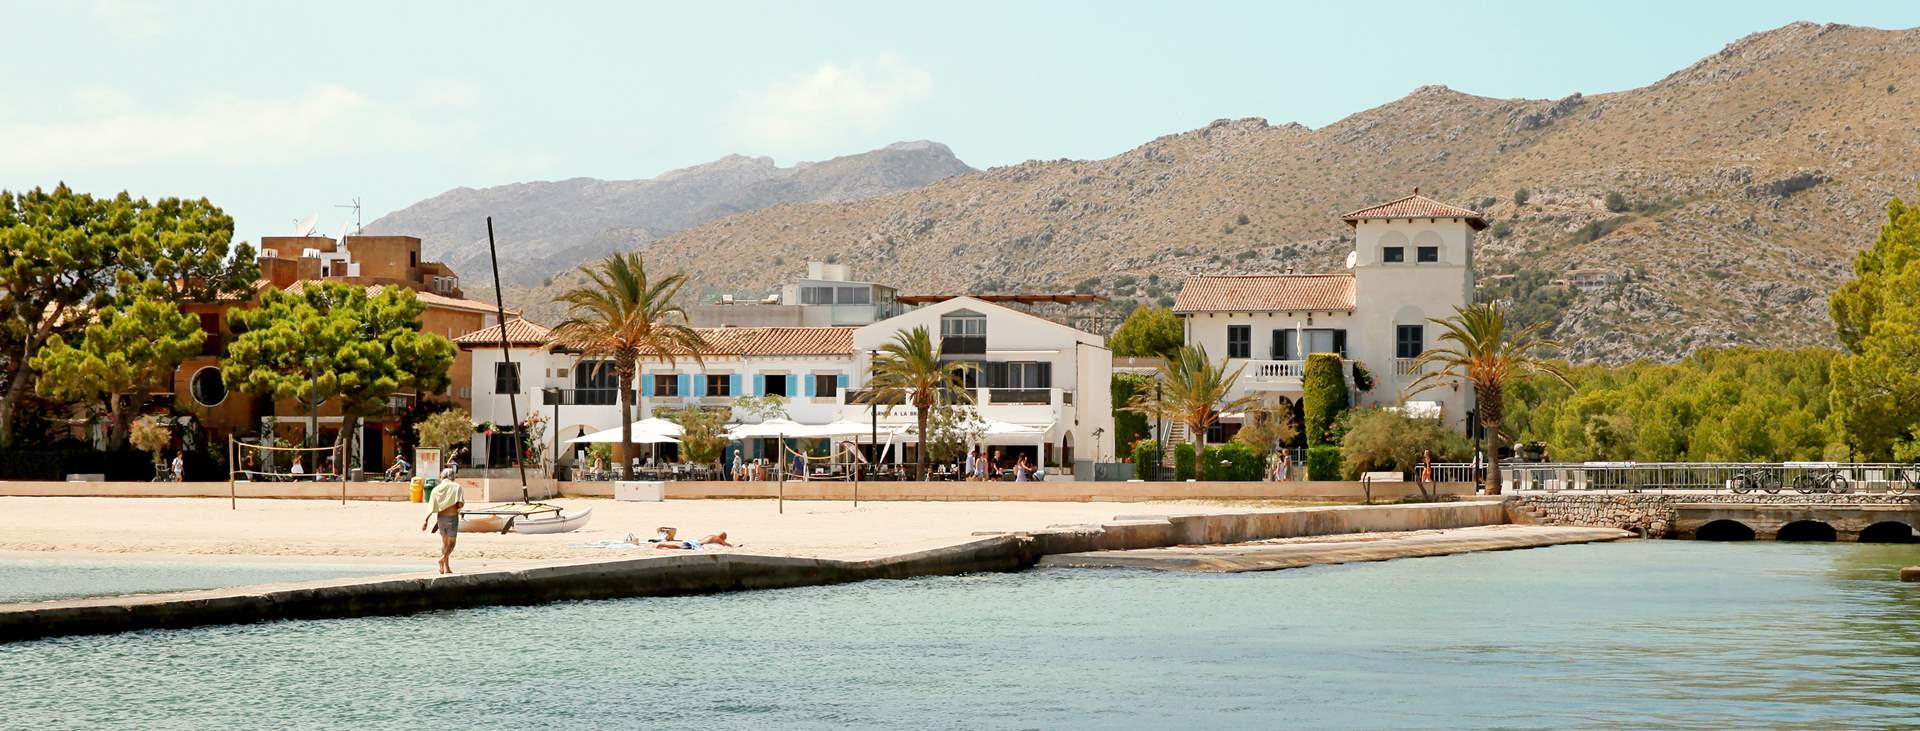 Bestill en reise med Ving til Puerto Pollensa på Mallorca